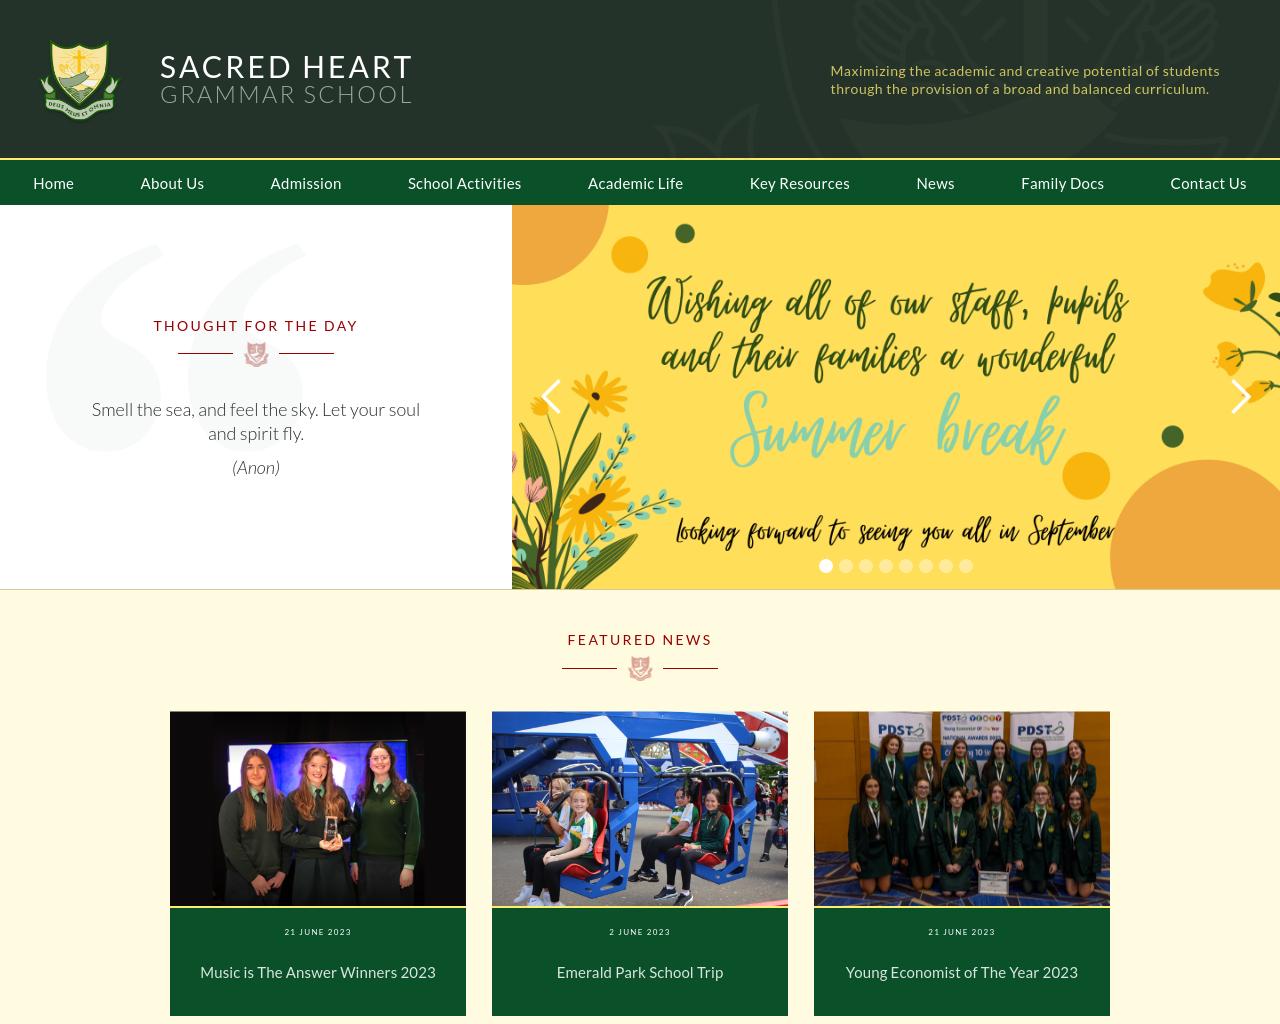 The Sacred Heart Grammar School